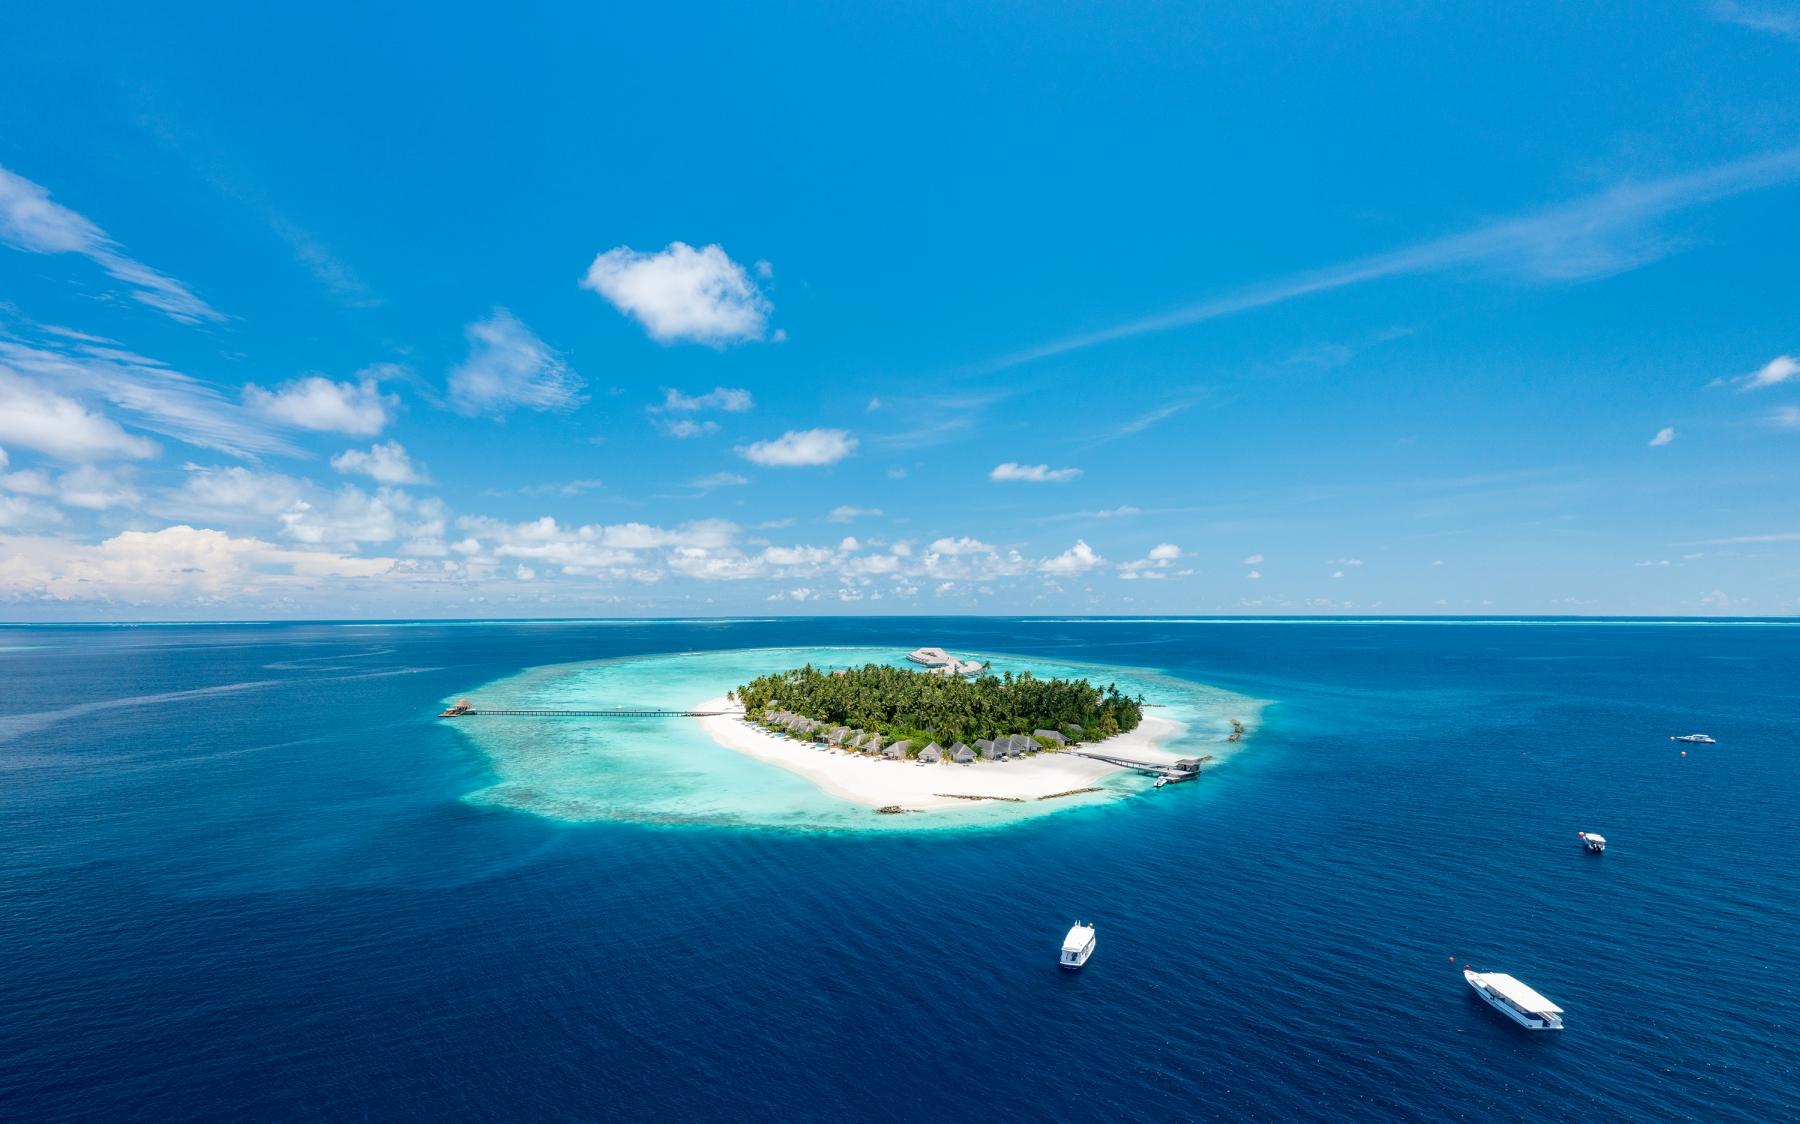 Baglioni Resort Maldives: частичка Италии в райских тропиках